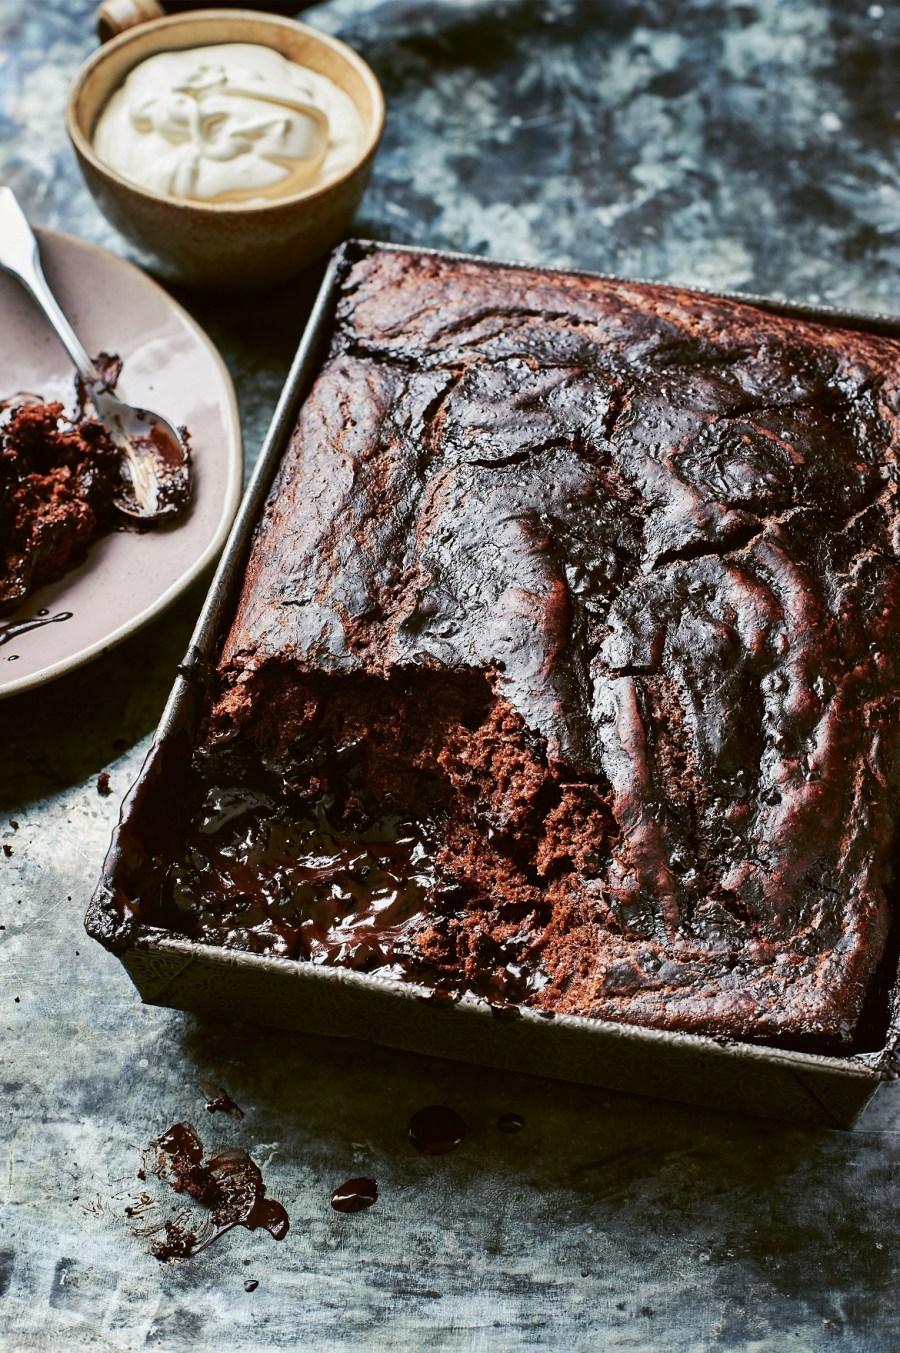 Magic_melting_mocha_cake_SMALL_2_